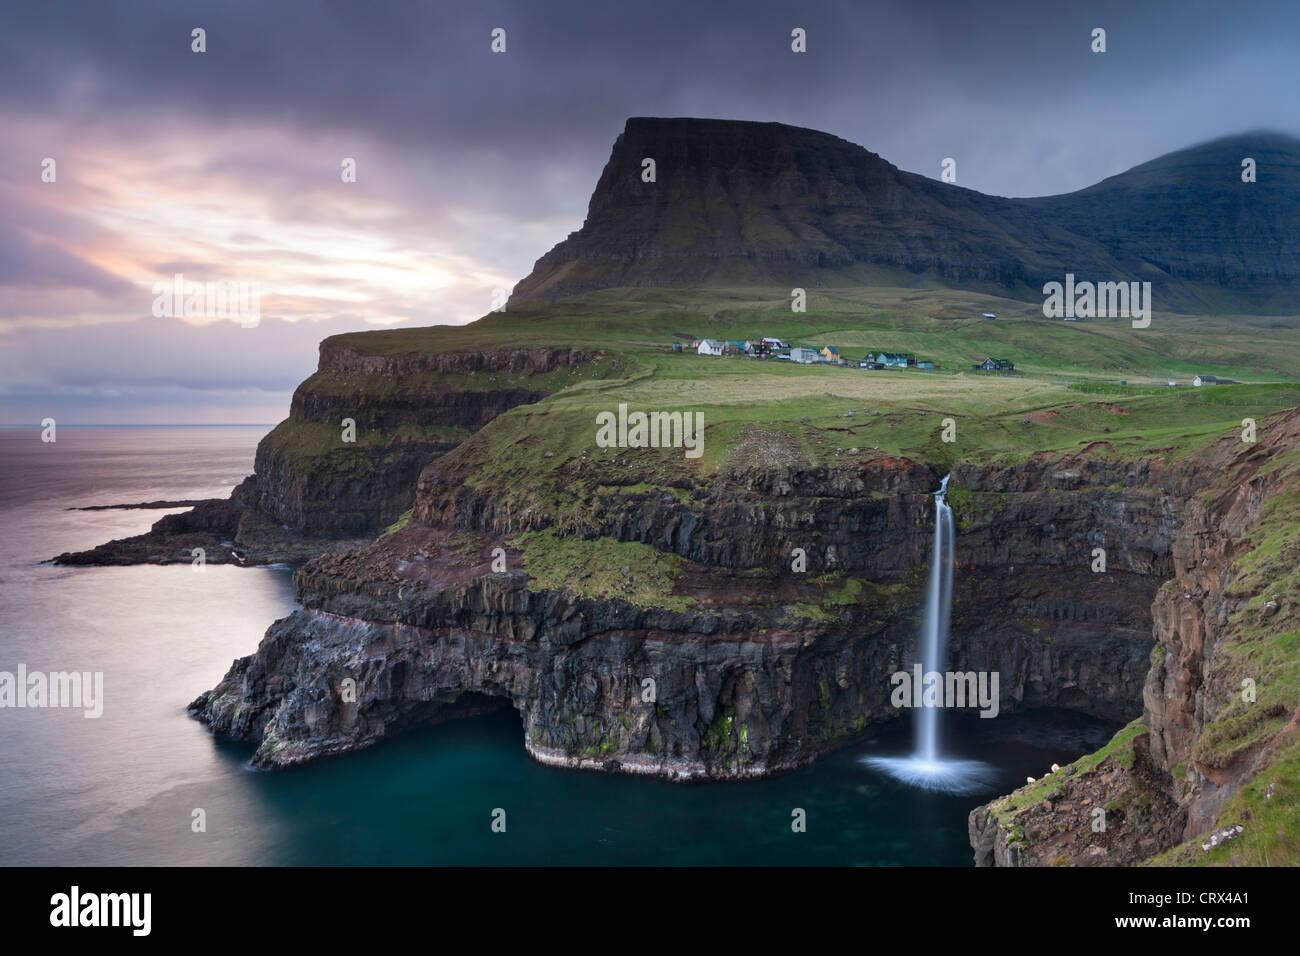 Dramatic coastal scenery at Gasadalur on the island of Vagar, Faroe Islands. Spring (May) 2012. - Stock Image